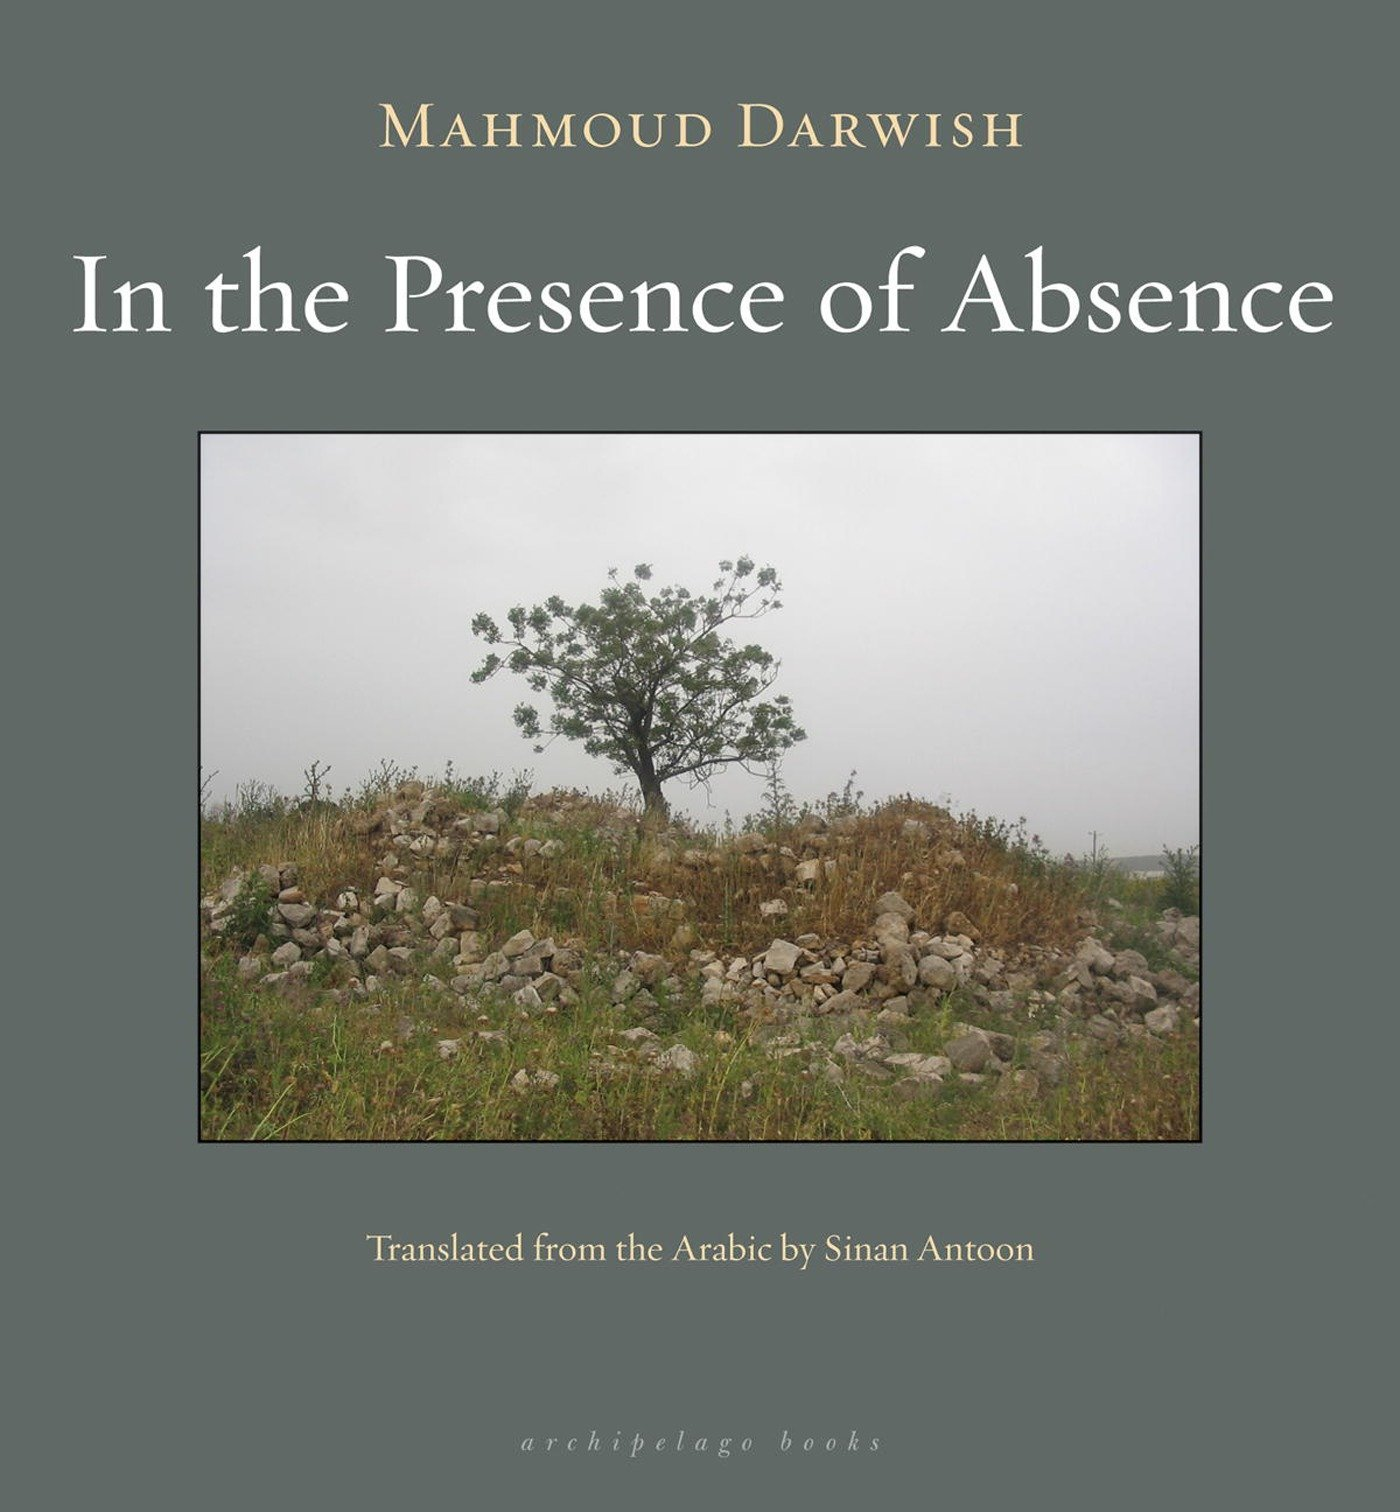 amazon in the presence of absence mahmoud darwish sinan antoon